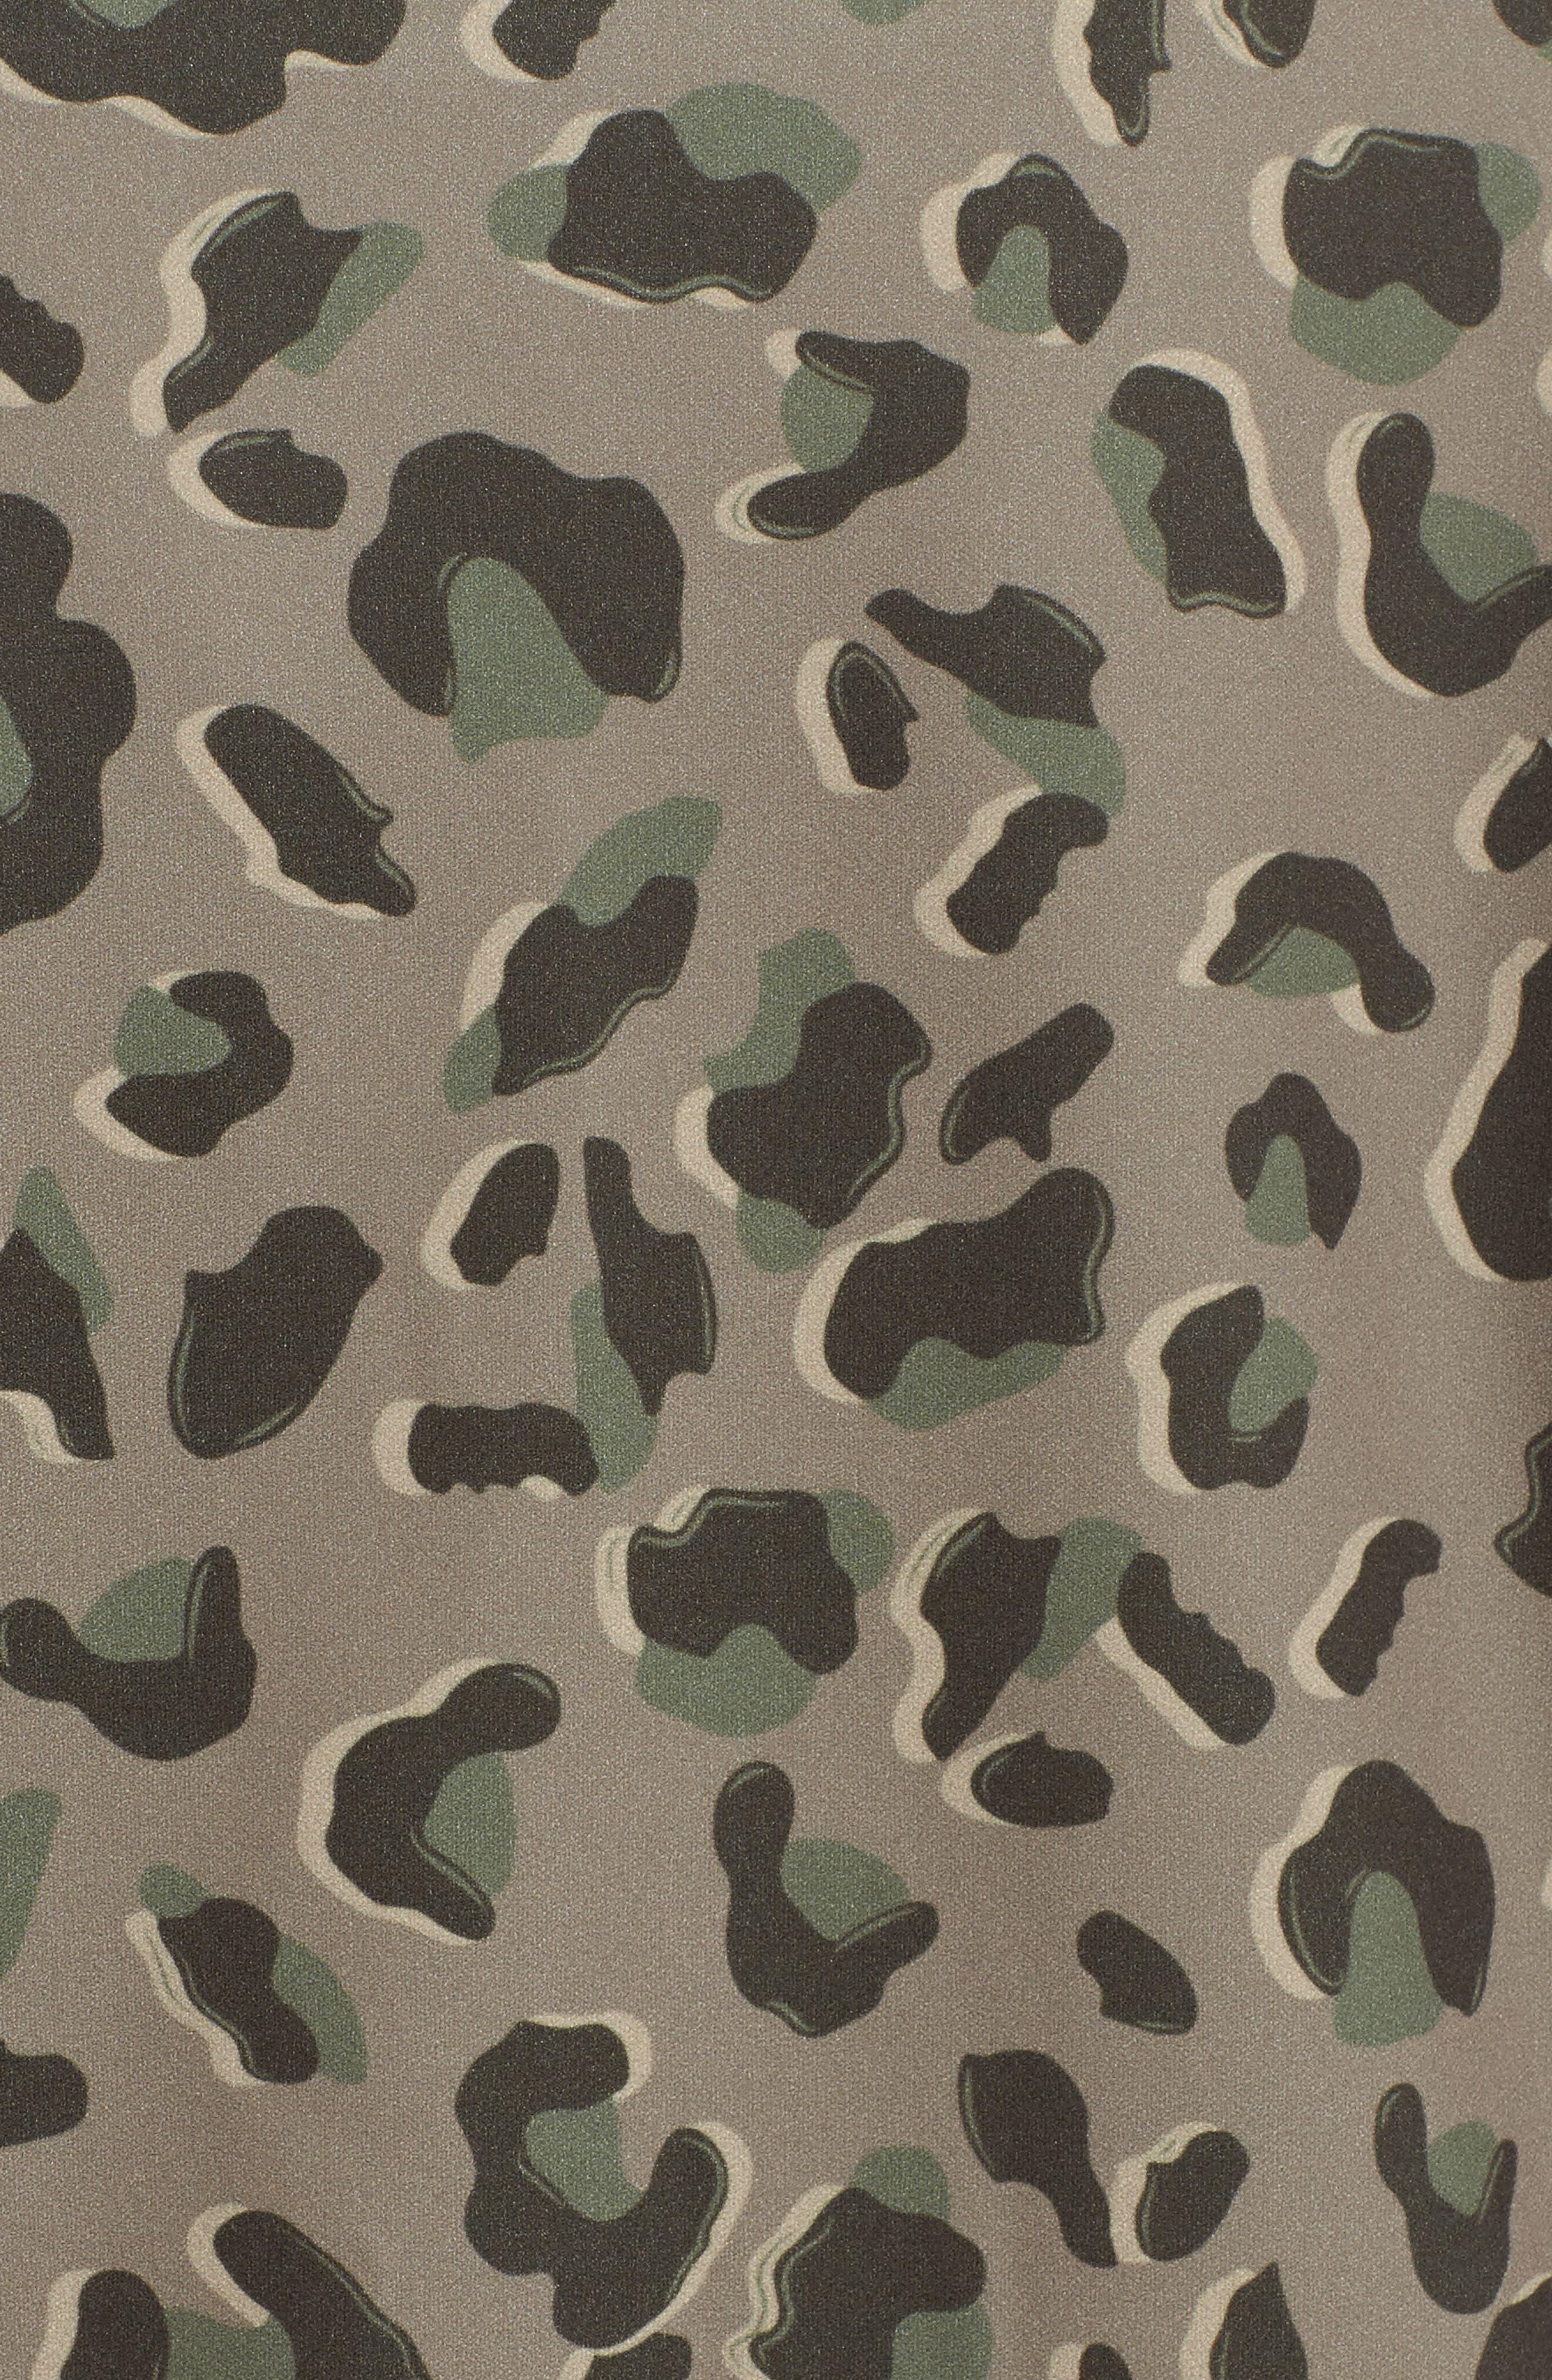 Osy Camo Print Jacket,                             Alternate thumbnail 6, color,                             301